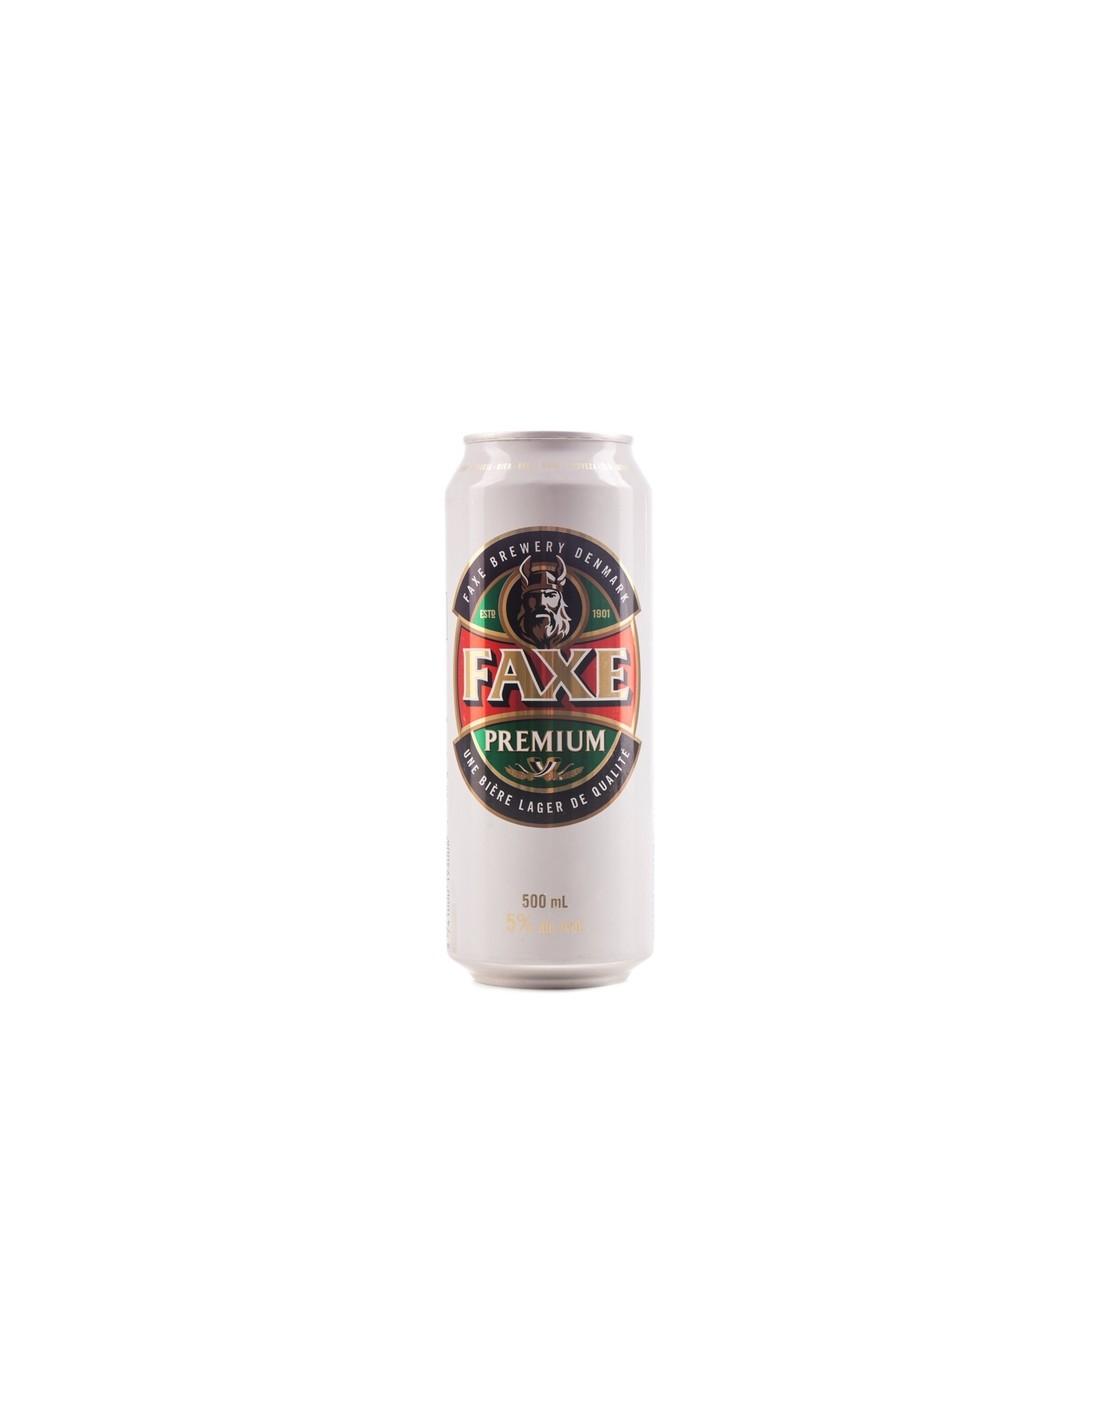 Bere blonda, filtrata Faxe Premium, 5% alc., 0.5L, Danemarca